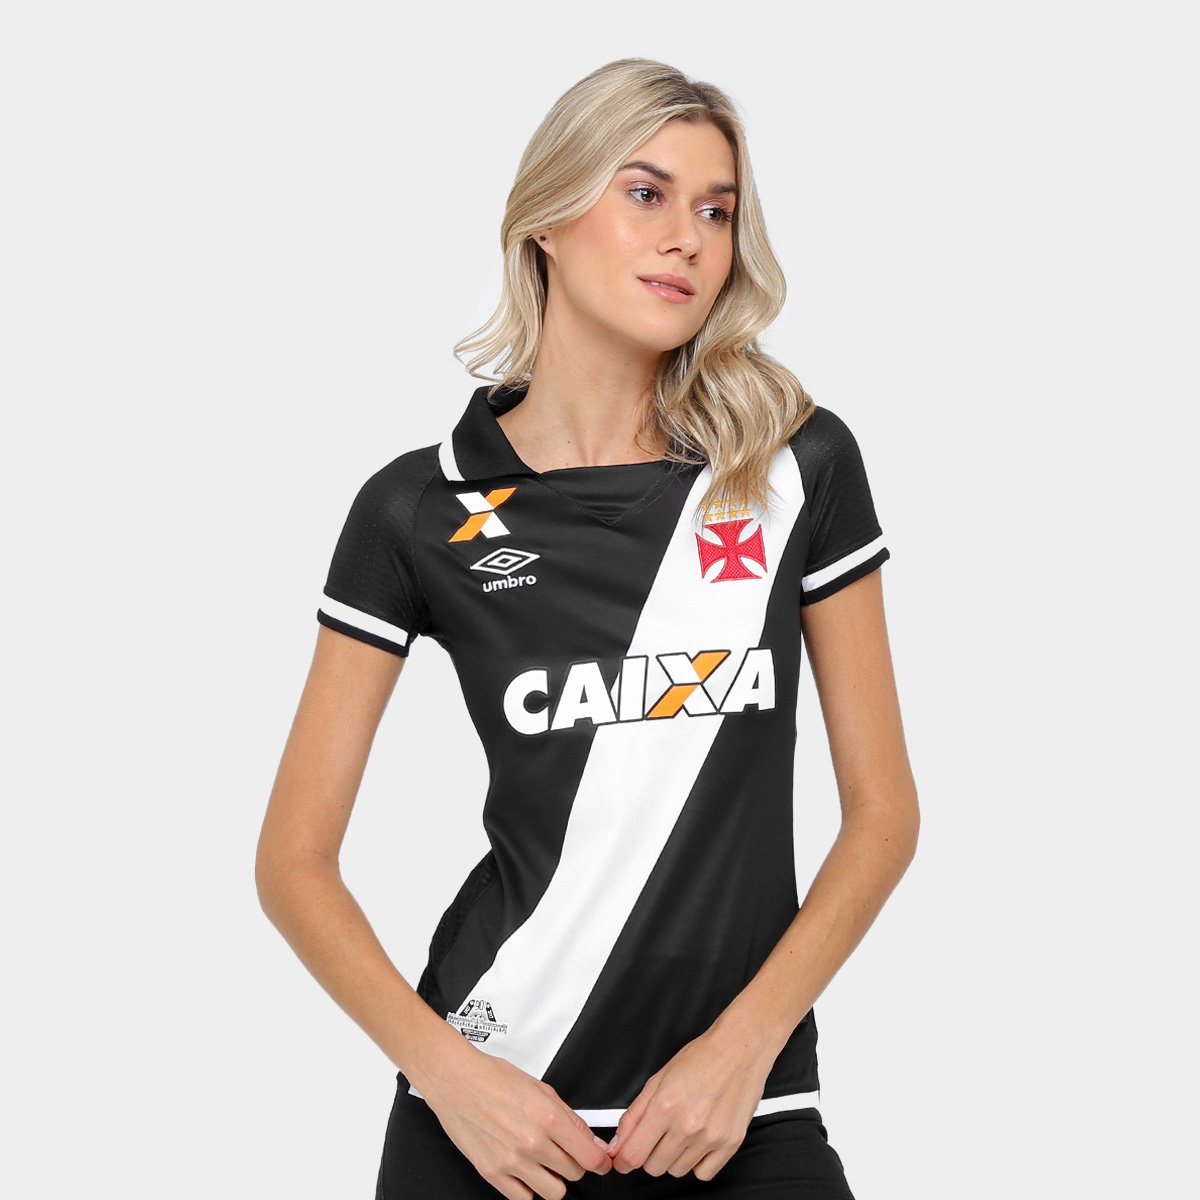 s Feminina Preto Camisa 18 e nº 17 Torcedor I Vasco Branco Umbro zB8qIT ... 7de8b8cda1c1e